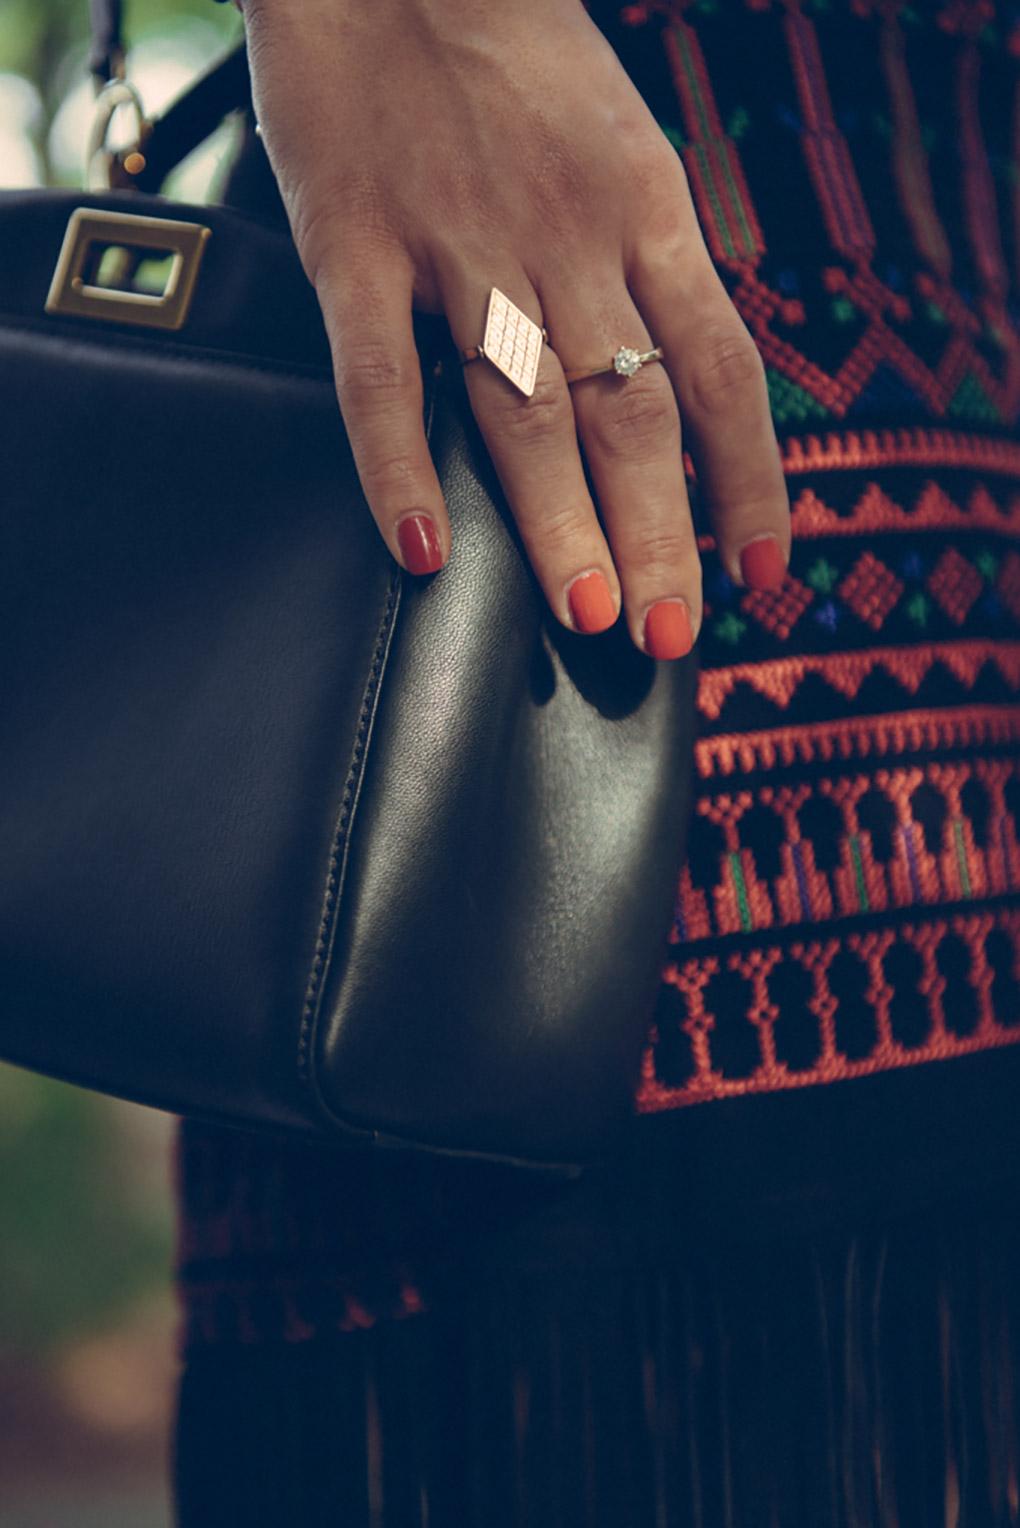 Lyla_Love_Fashion_Mochi_Fringe_skirt-21